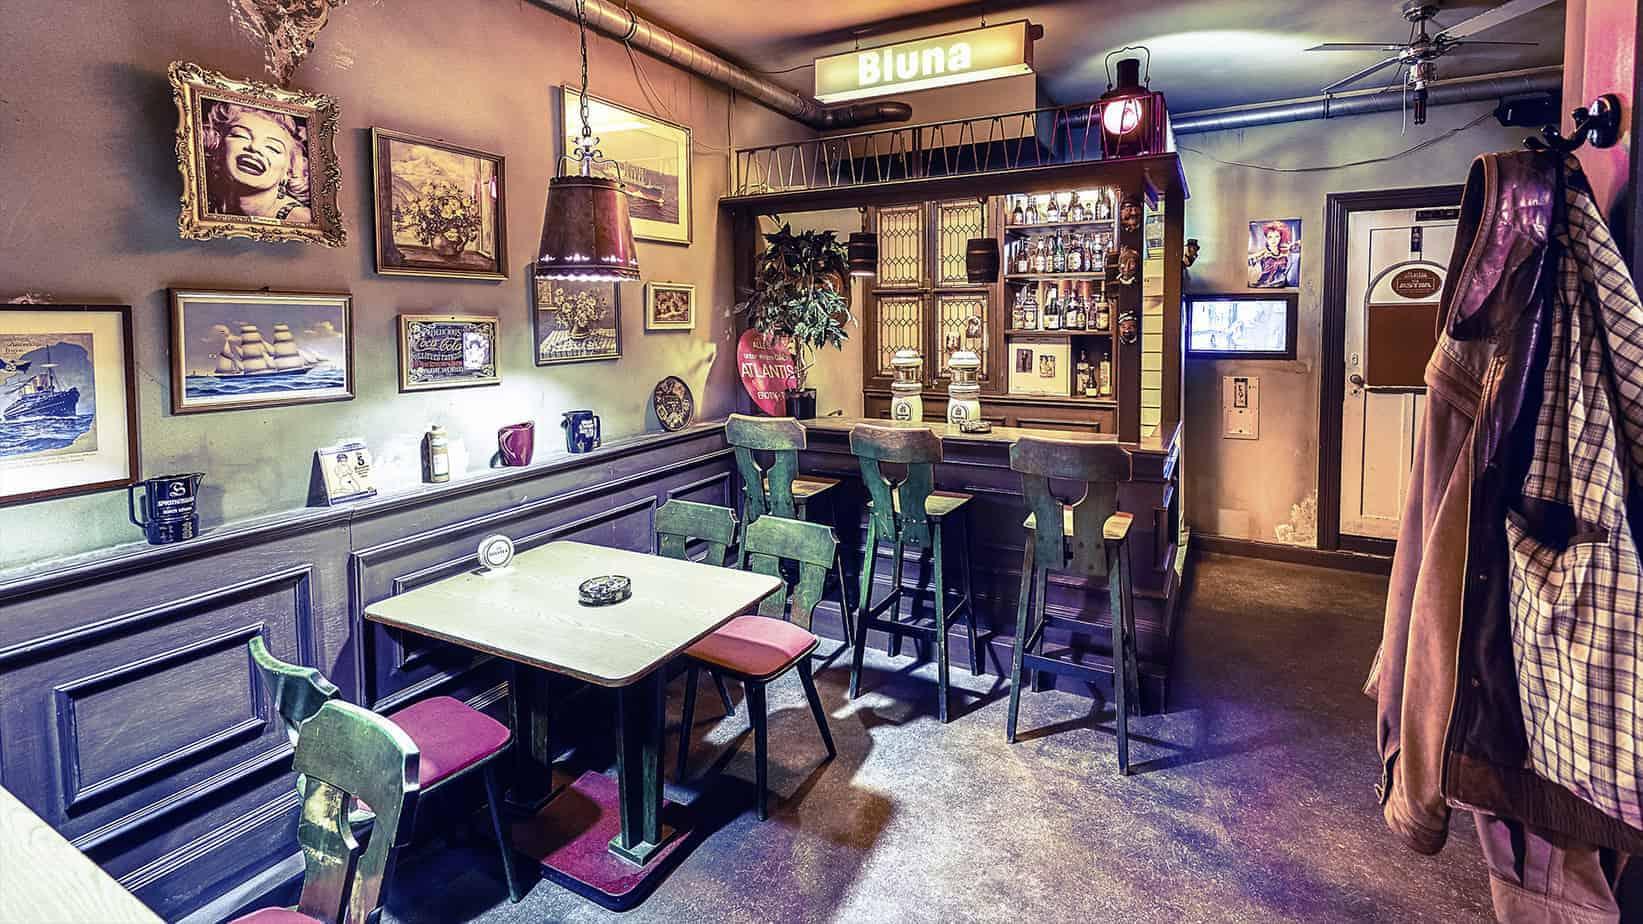 Skurrilum im Klubhaus St. Pauli Foto: Lukas Nimscheck